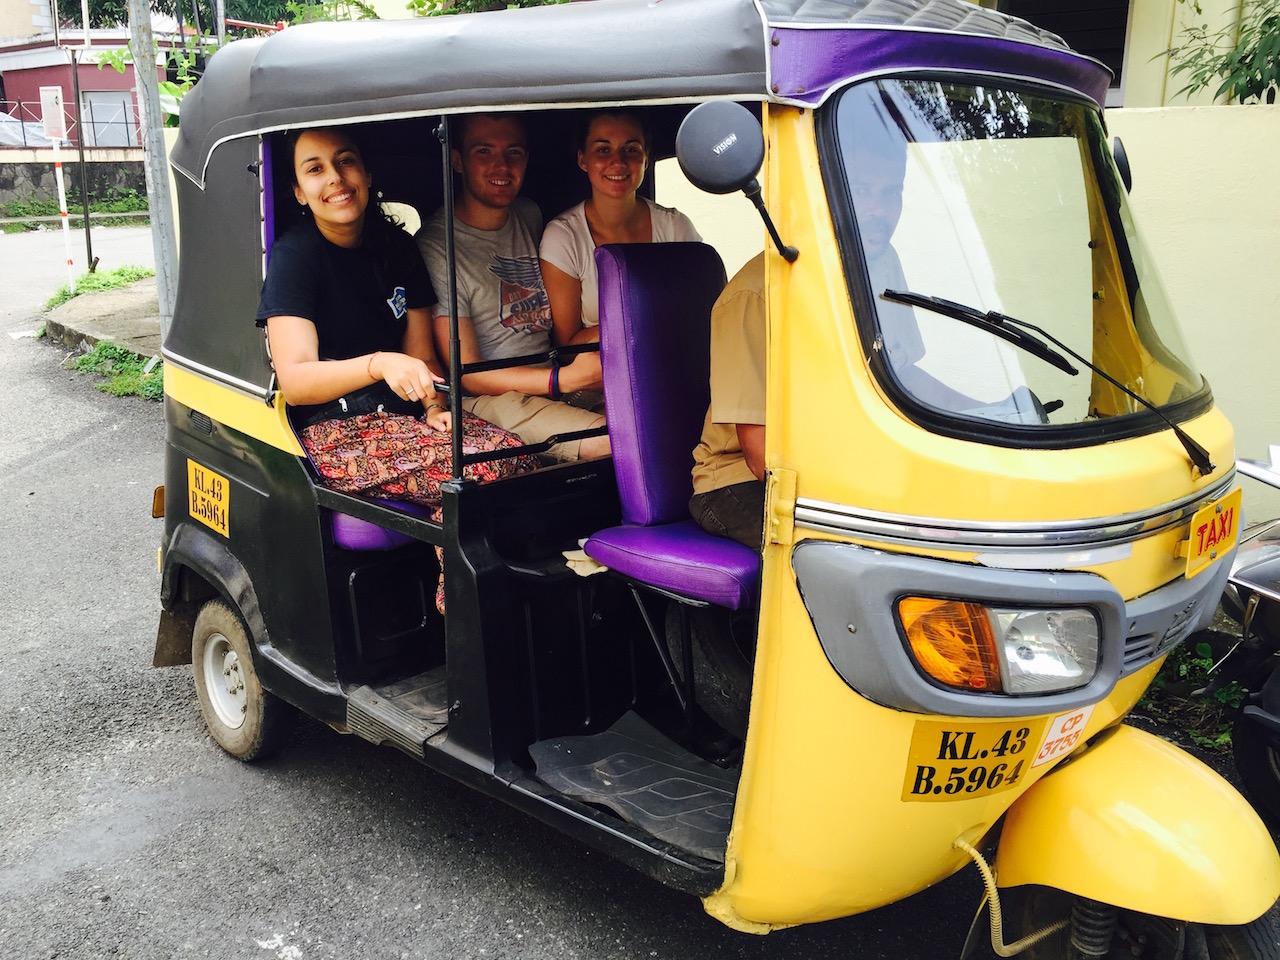 Volunteer Abroad in India, Thailand, Sri Lanka